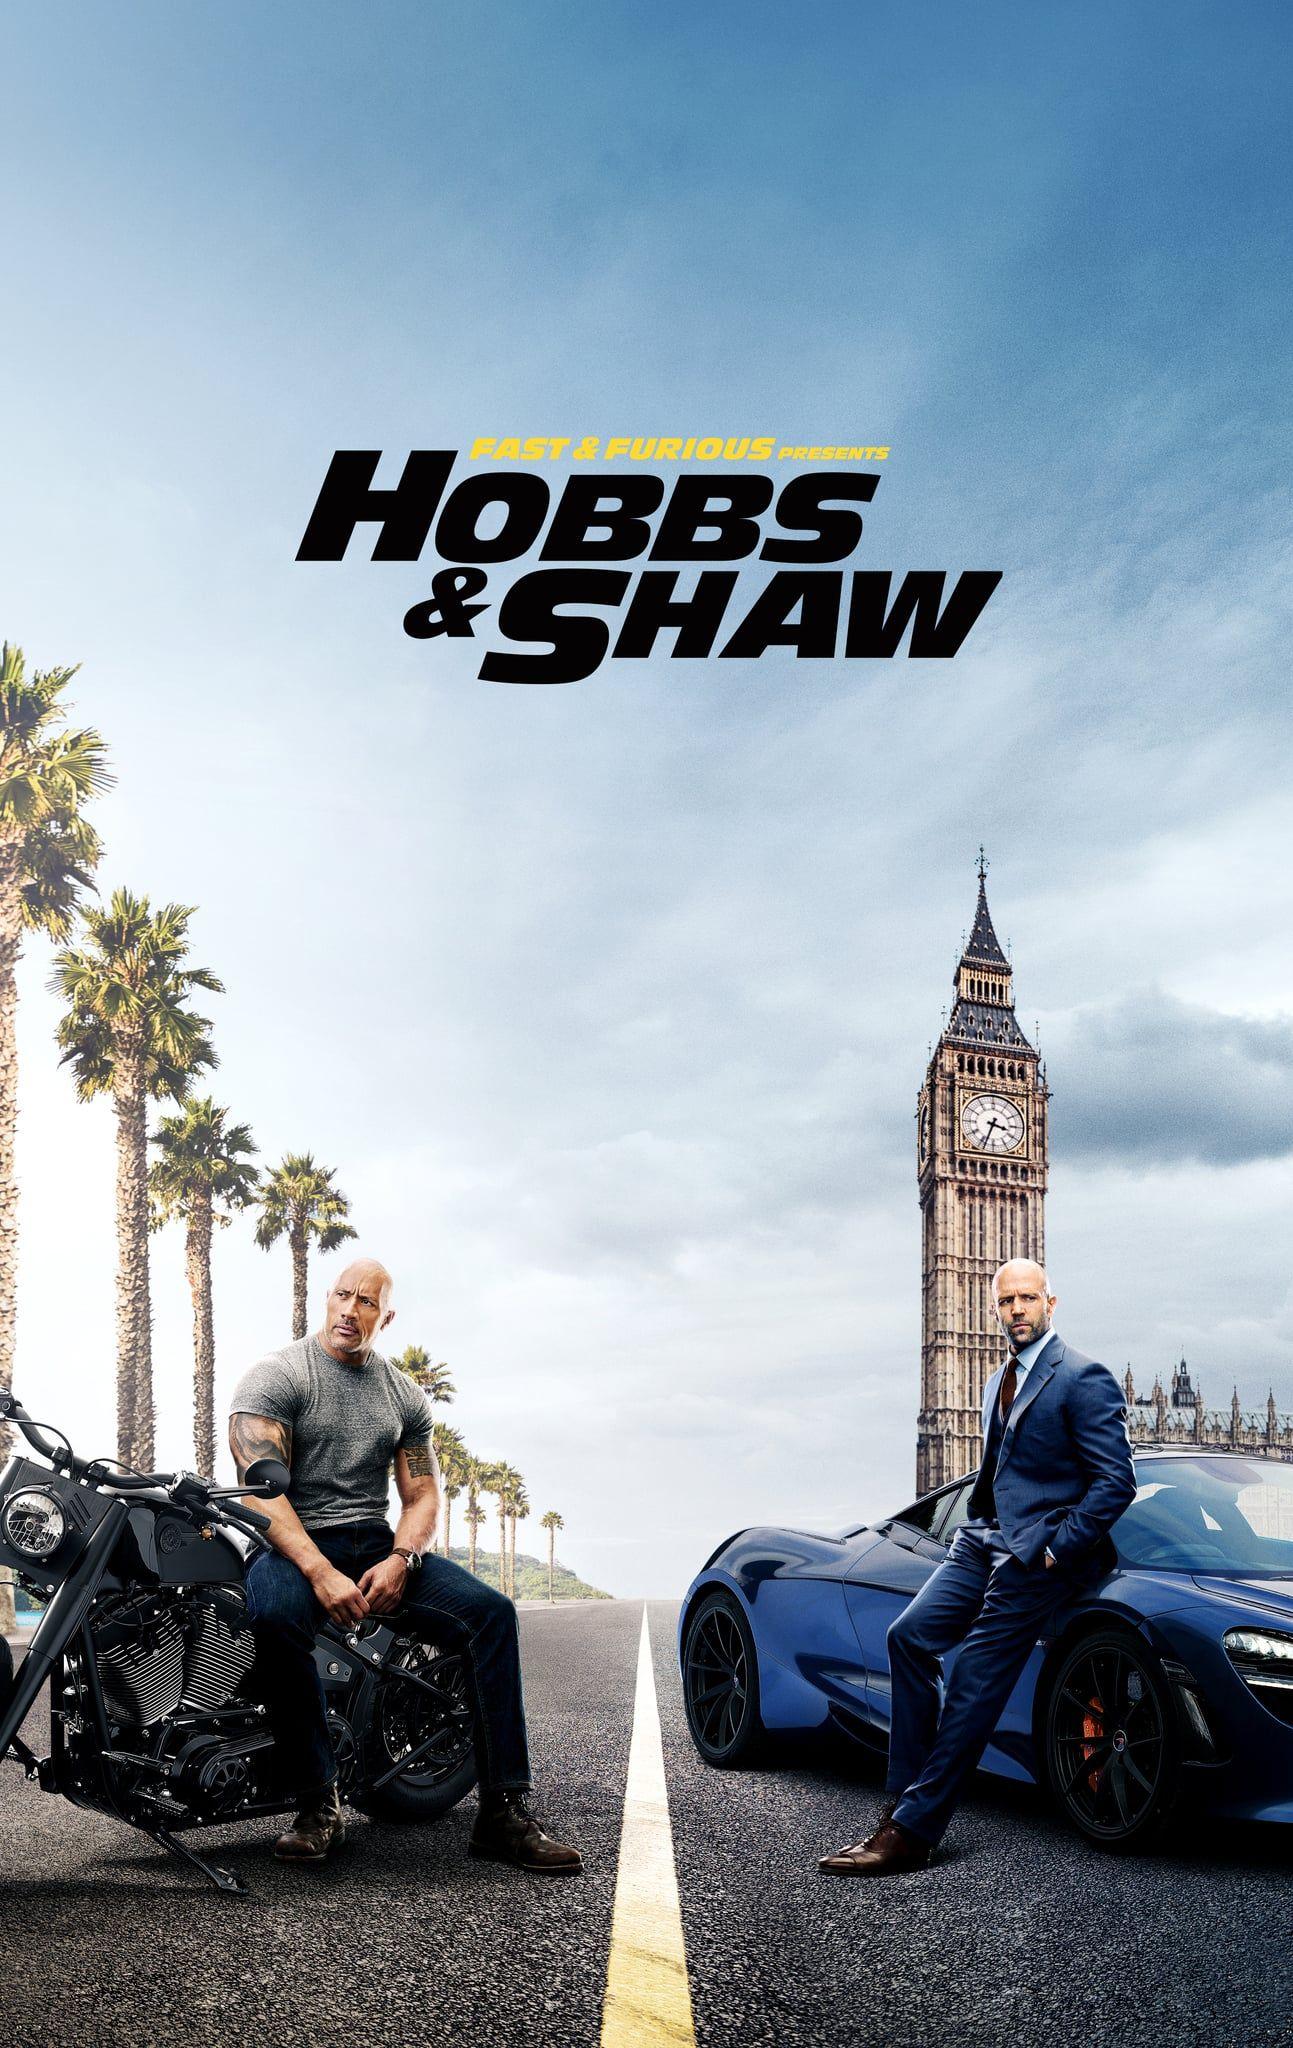 Voir Fast Furious Hobbs Shaw 2019 En Streaming Vf Hd Fast And Furious Film Eiza Gonzalez